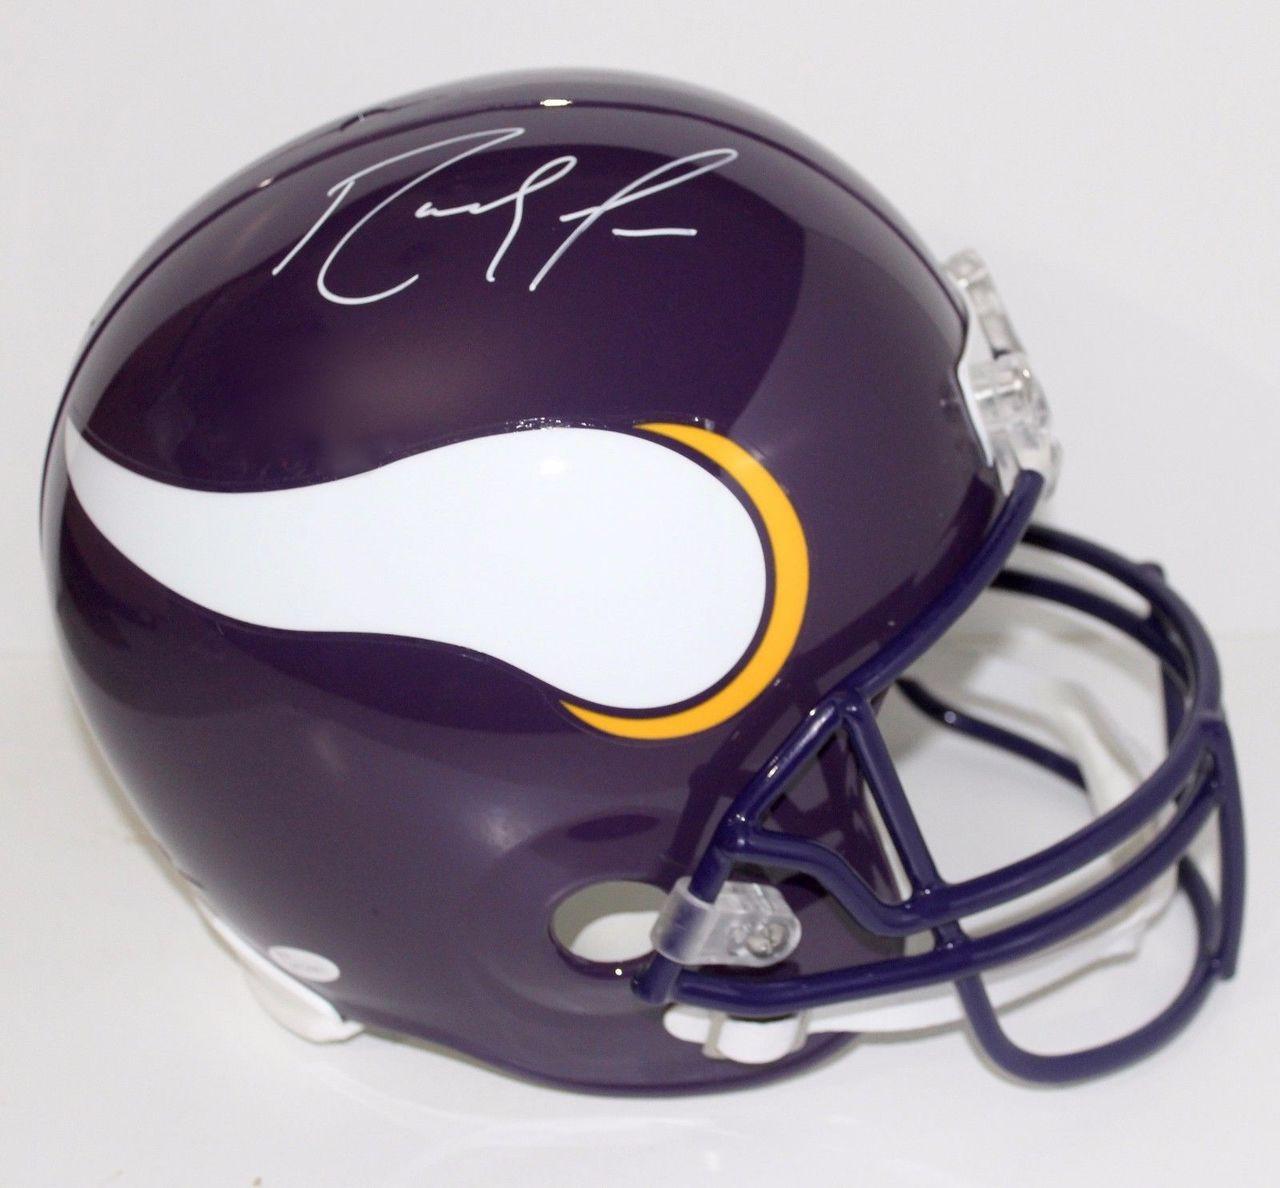 separation shoes f4cfa 6ade2 Randy Moss Minnesota Vikings Autographed Full Size Replica Helmet